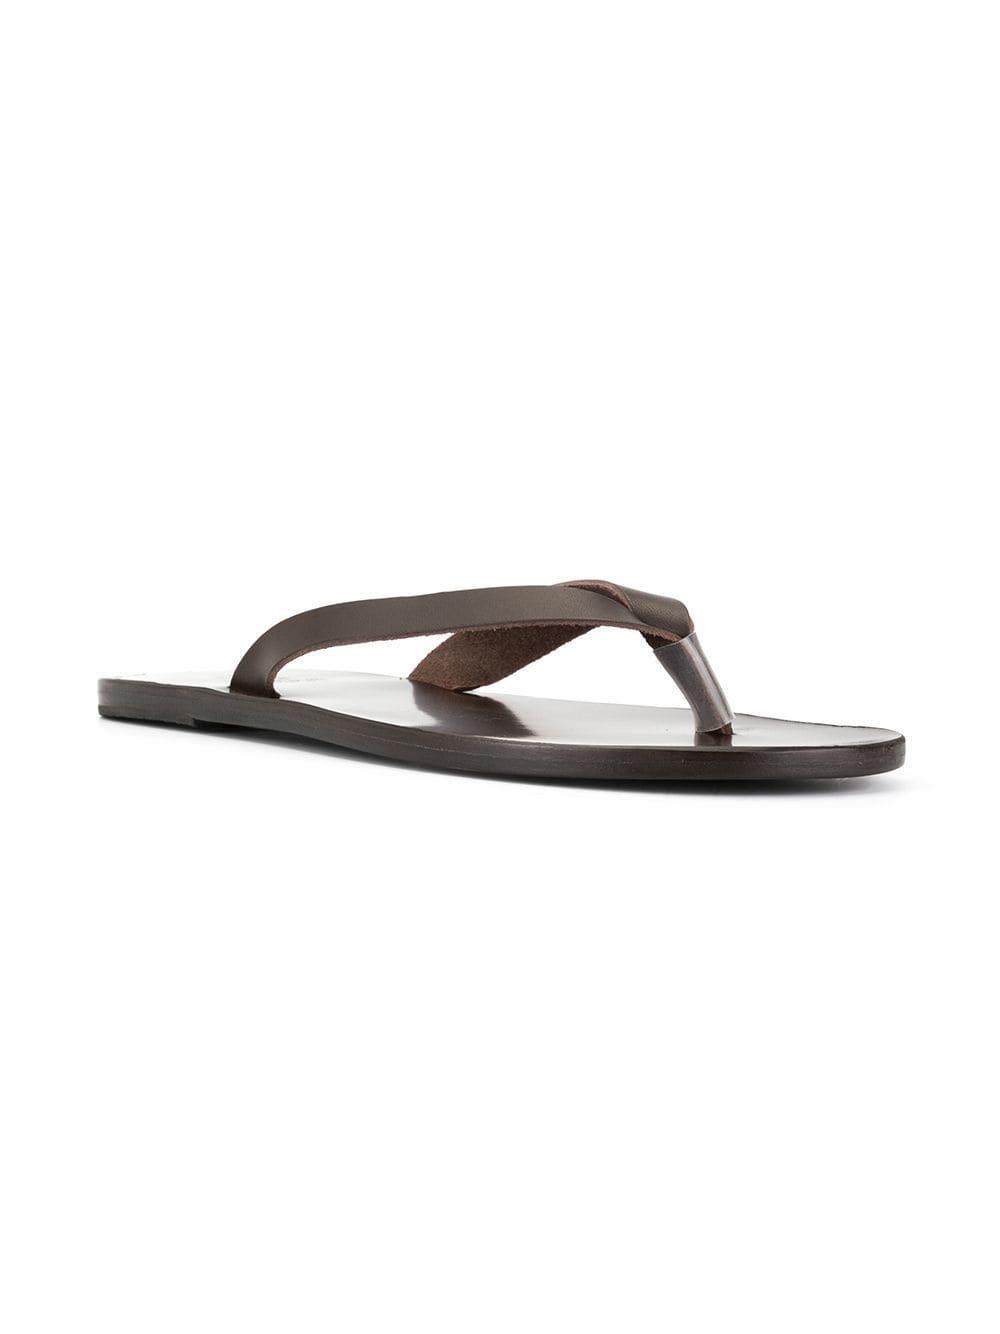 c8f868135386b0 Ancient Greek Sandals - Brown Hero Sandals for Men - Lyst. View fullscreen